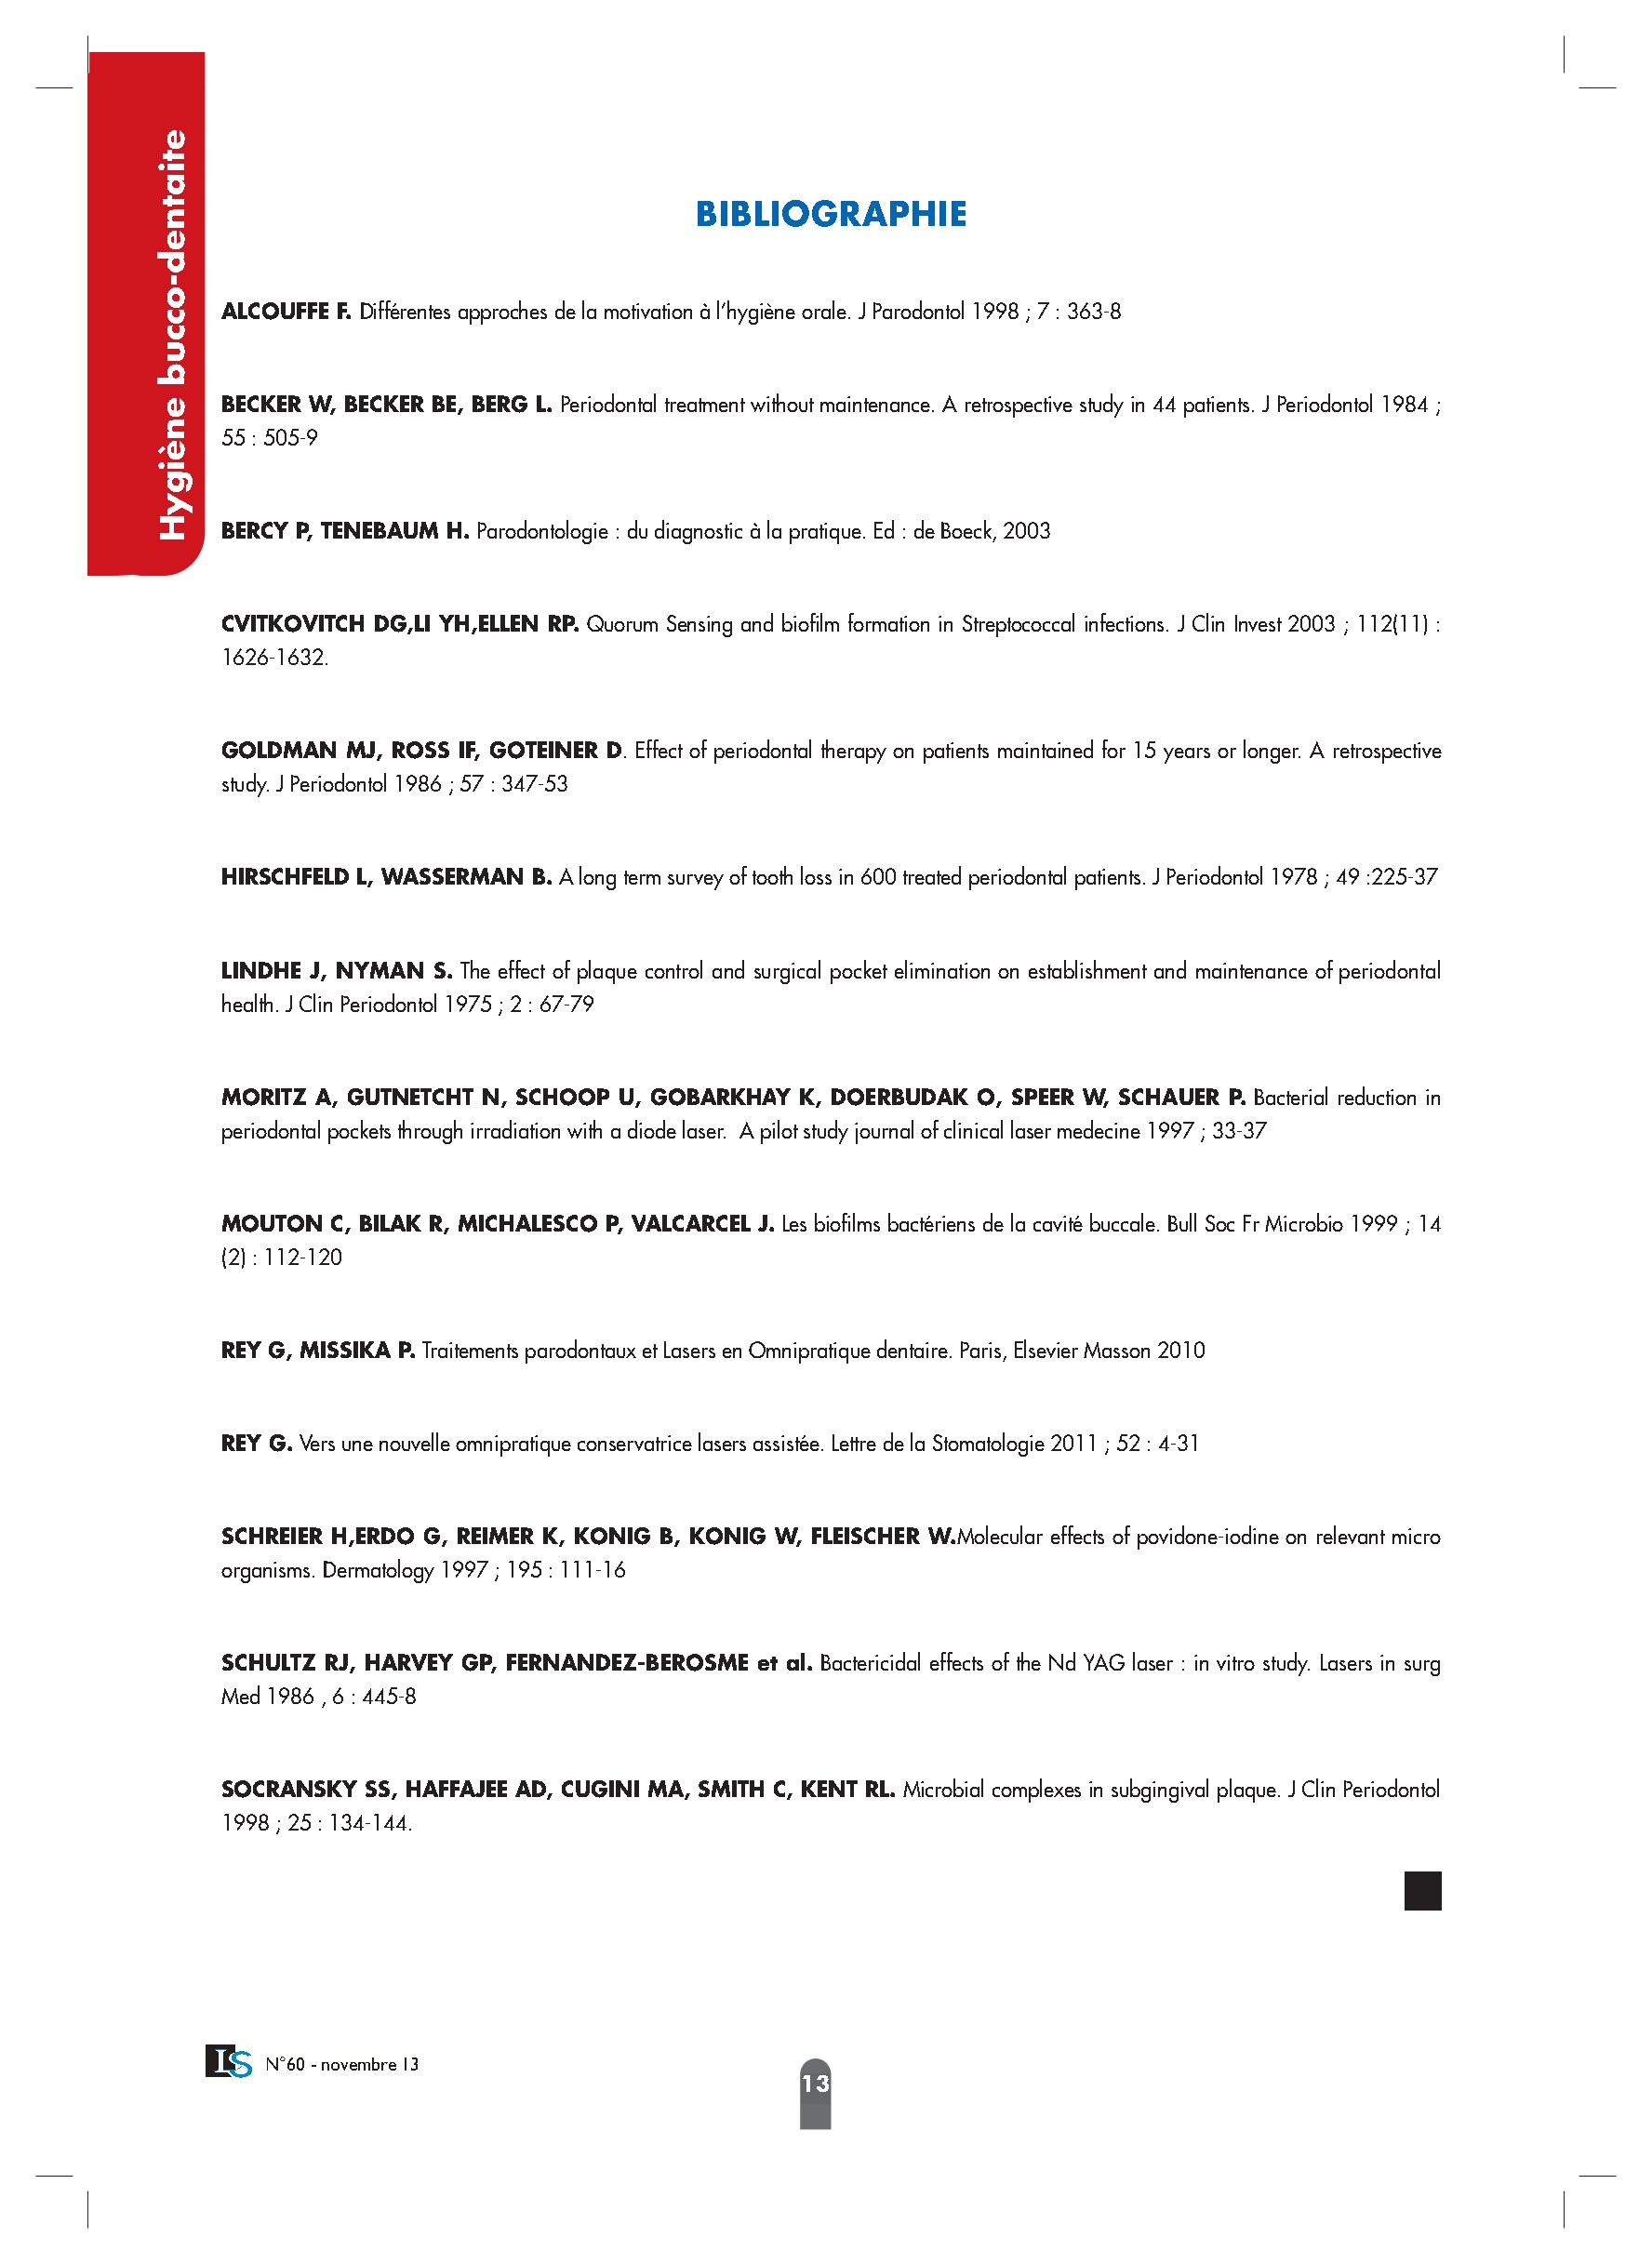 Etude11-page13